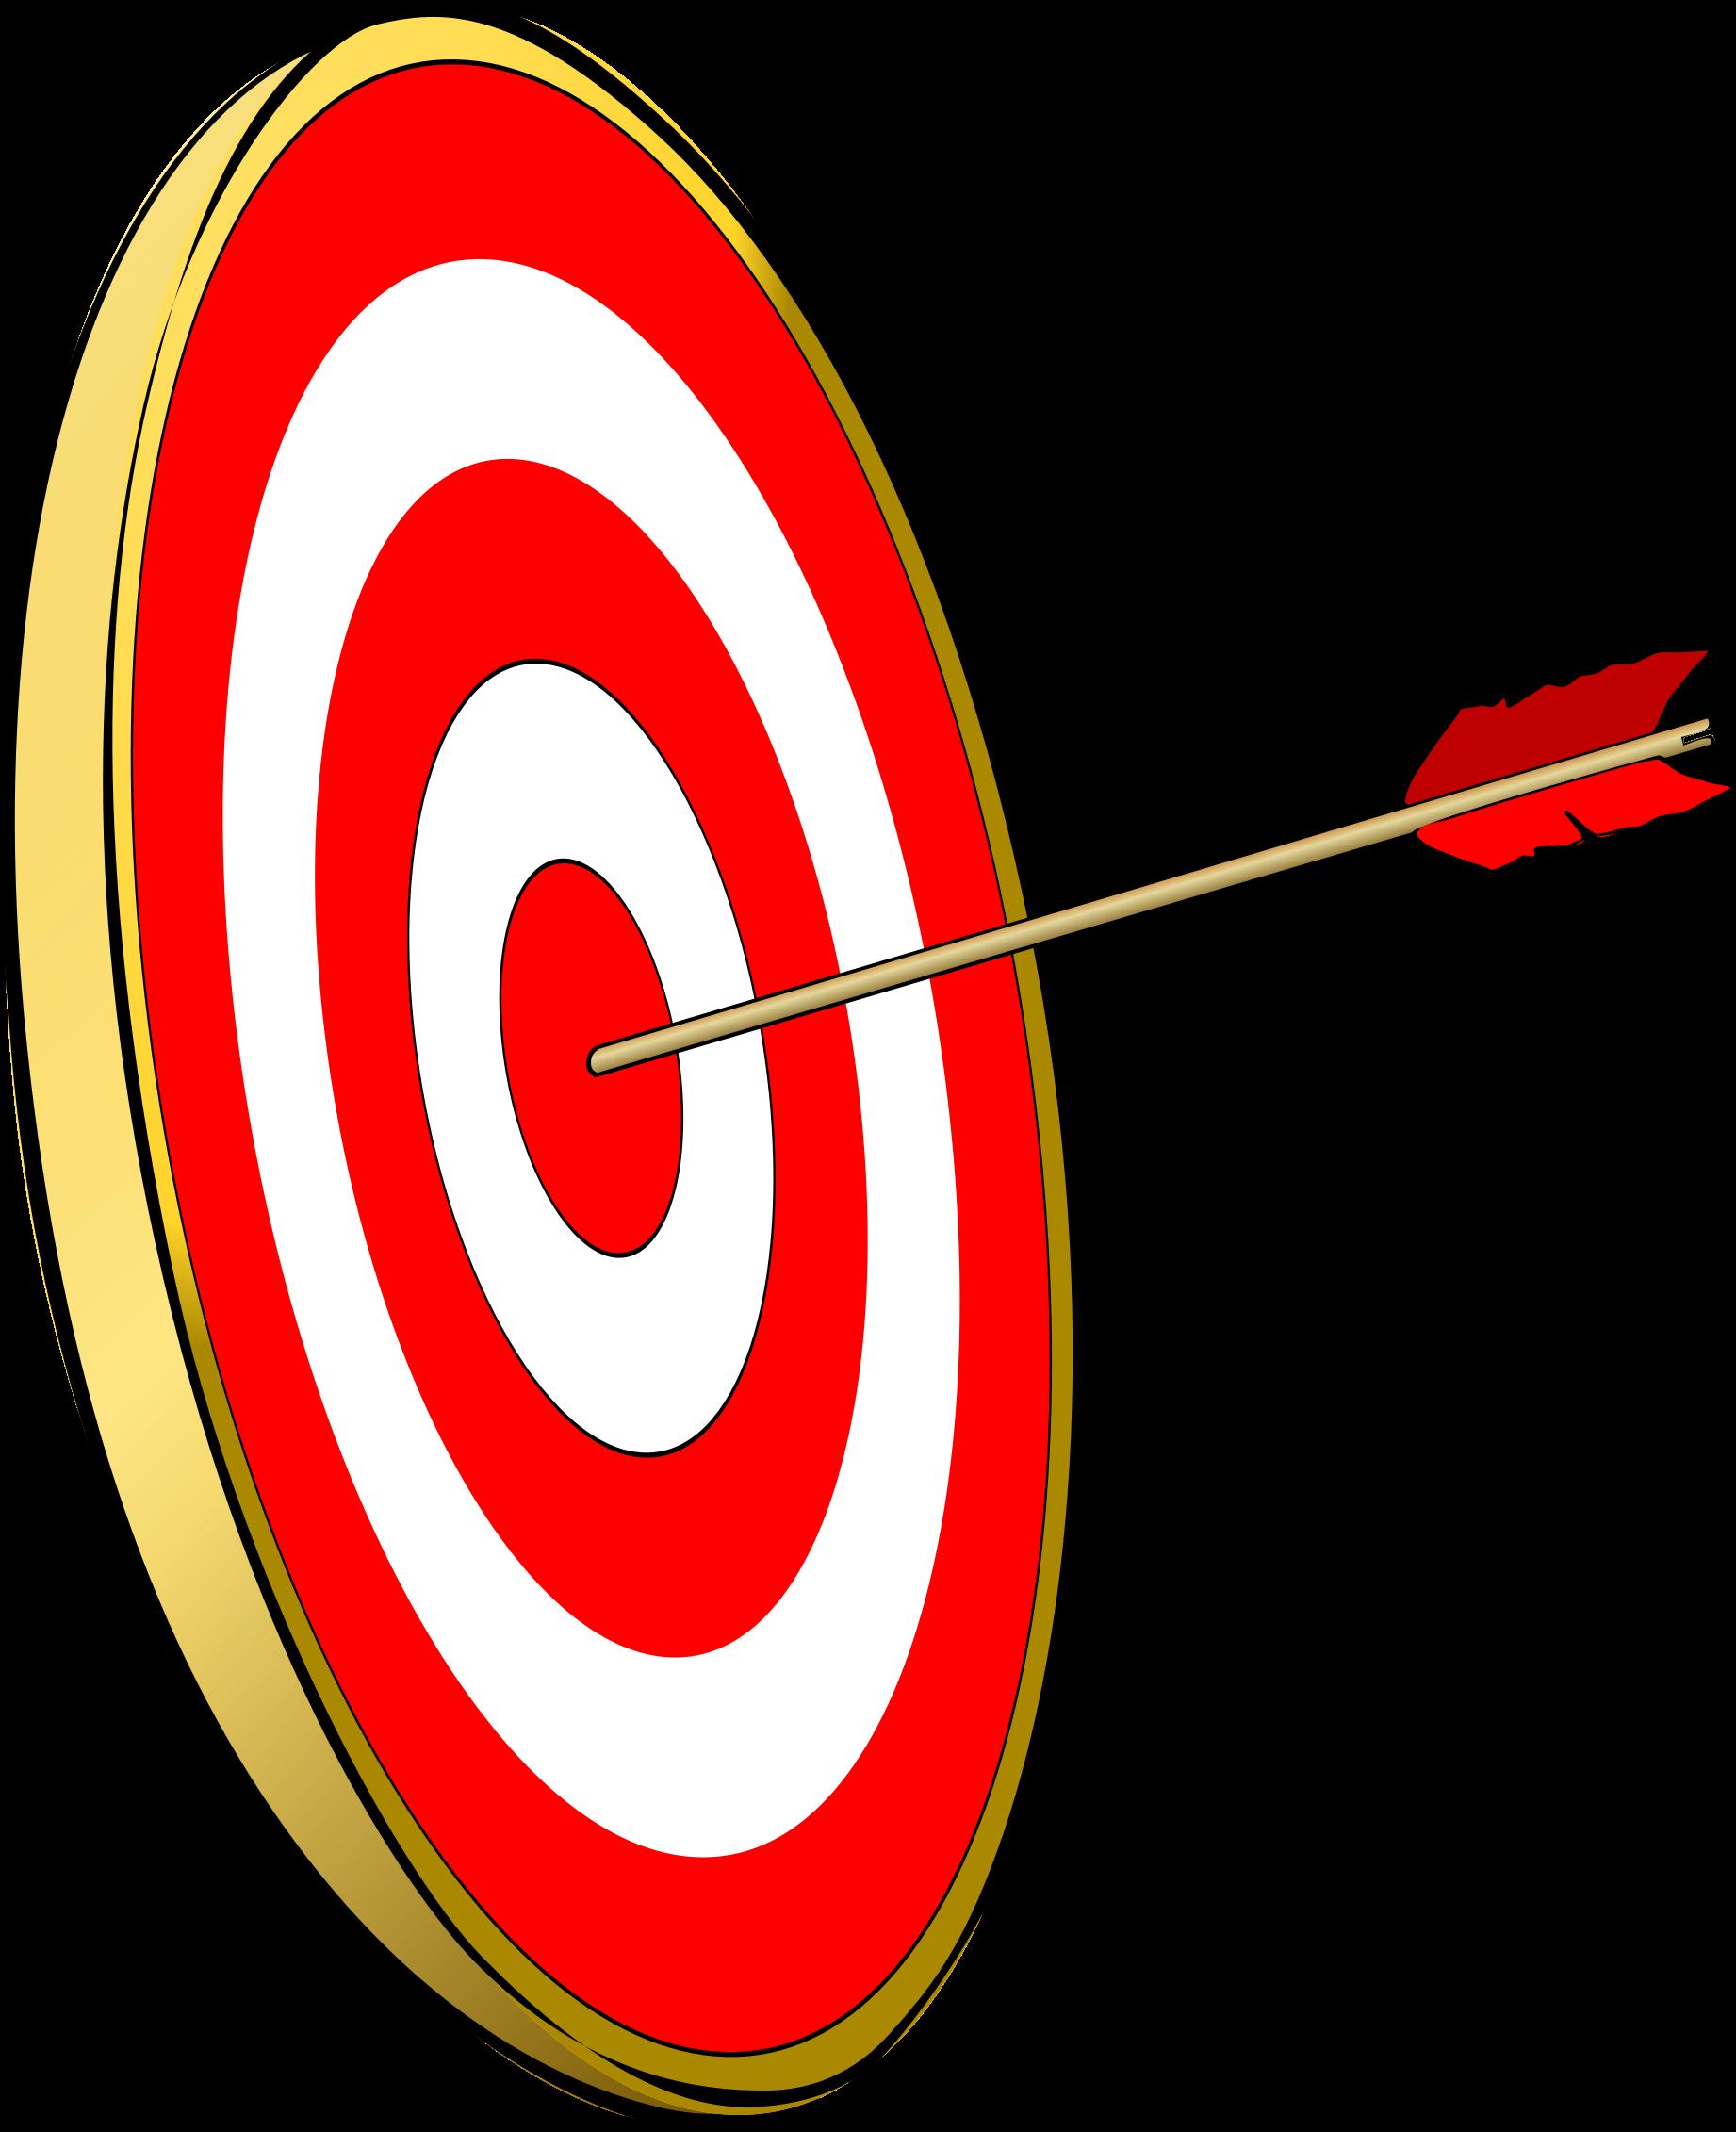 Motivation clipart arrow. Bullseye by amcolley an